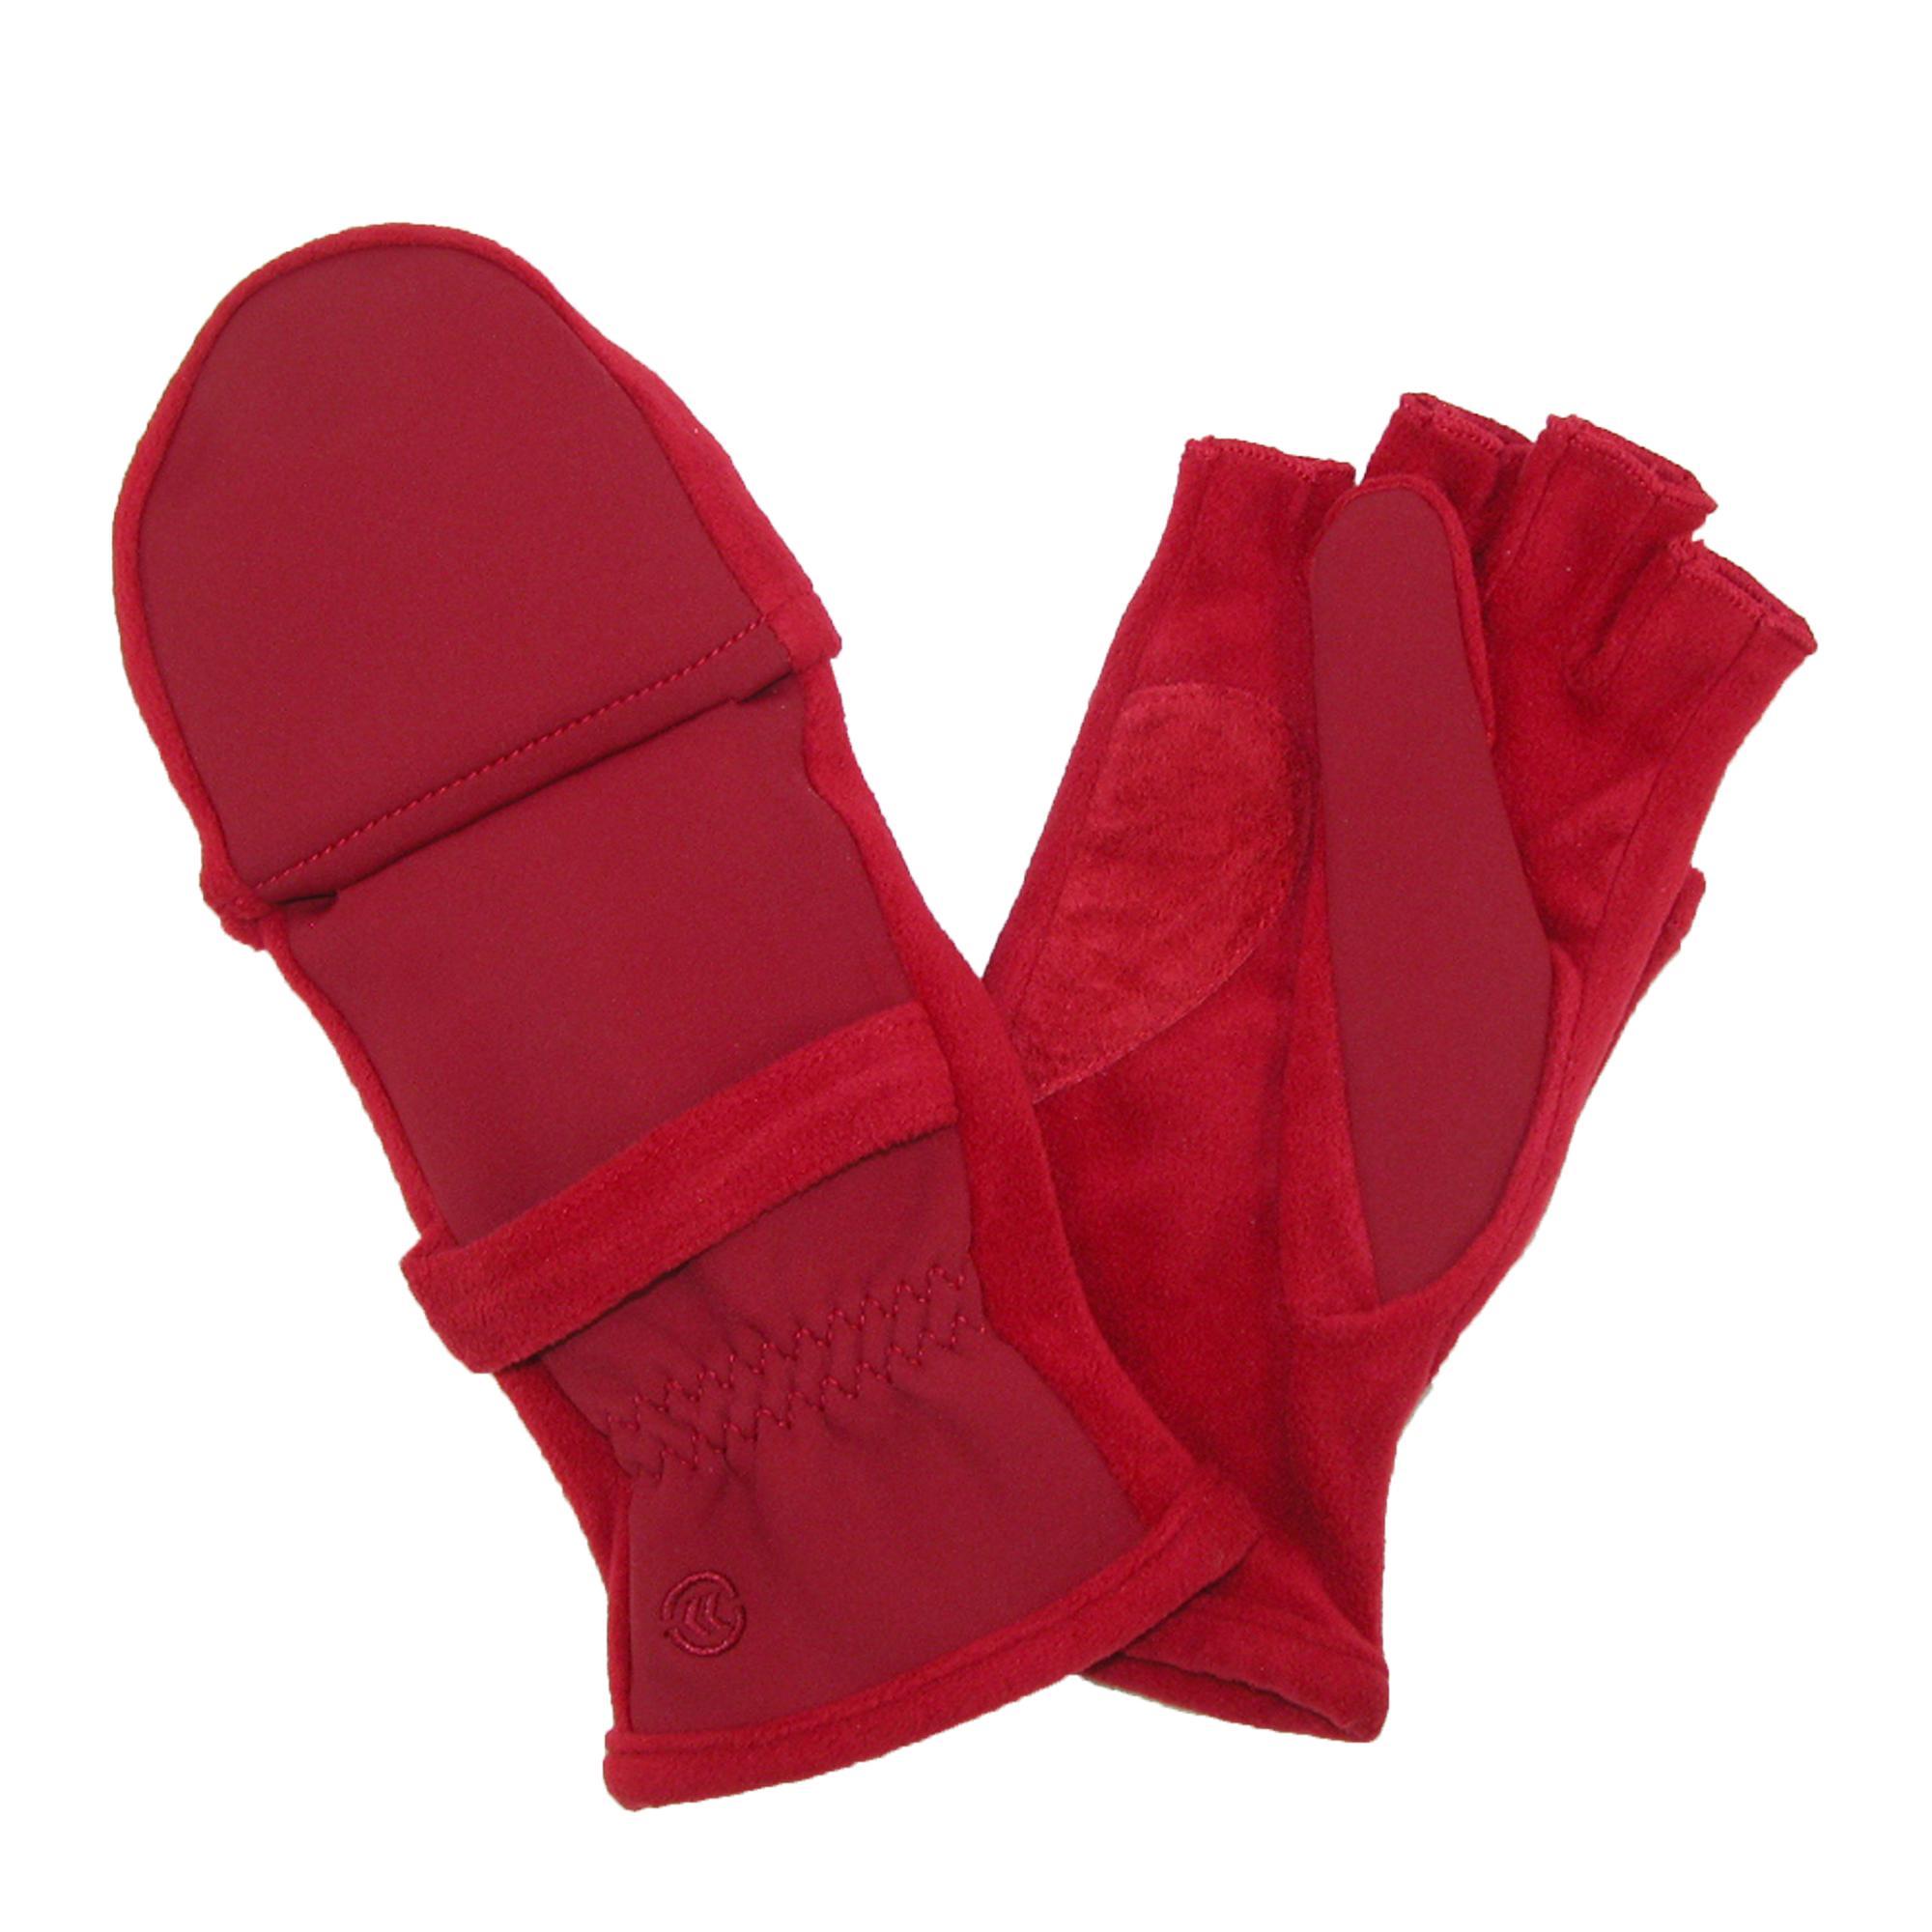 Fingerless gloves isotoner - New Isotoner Women 039 S Fleece Stretch Convertible